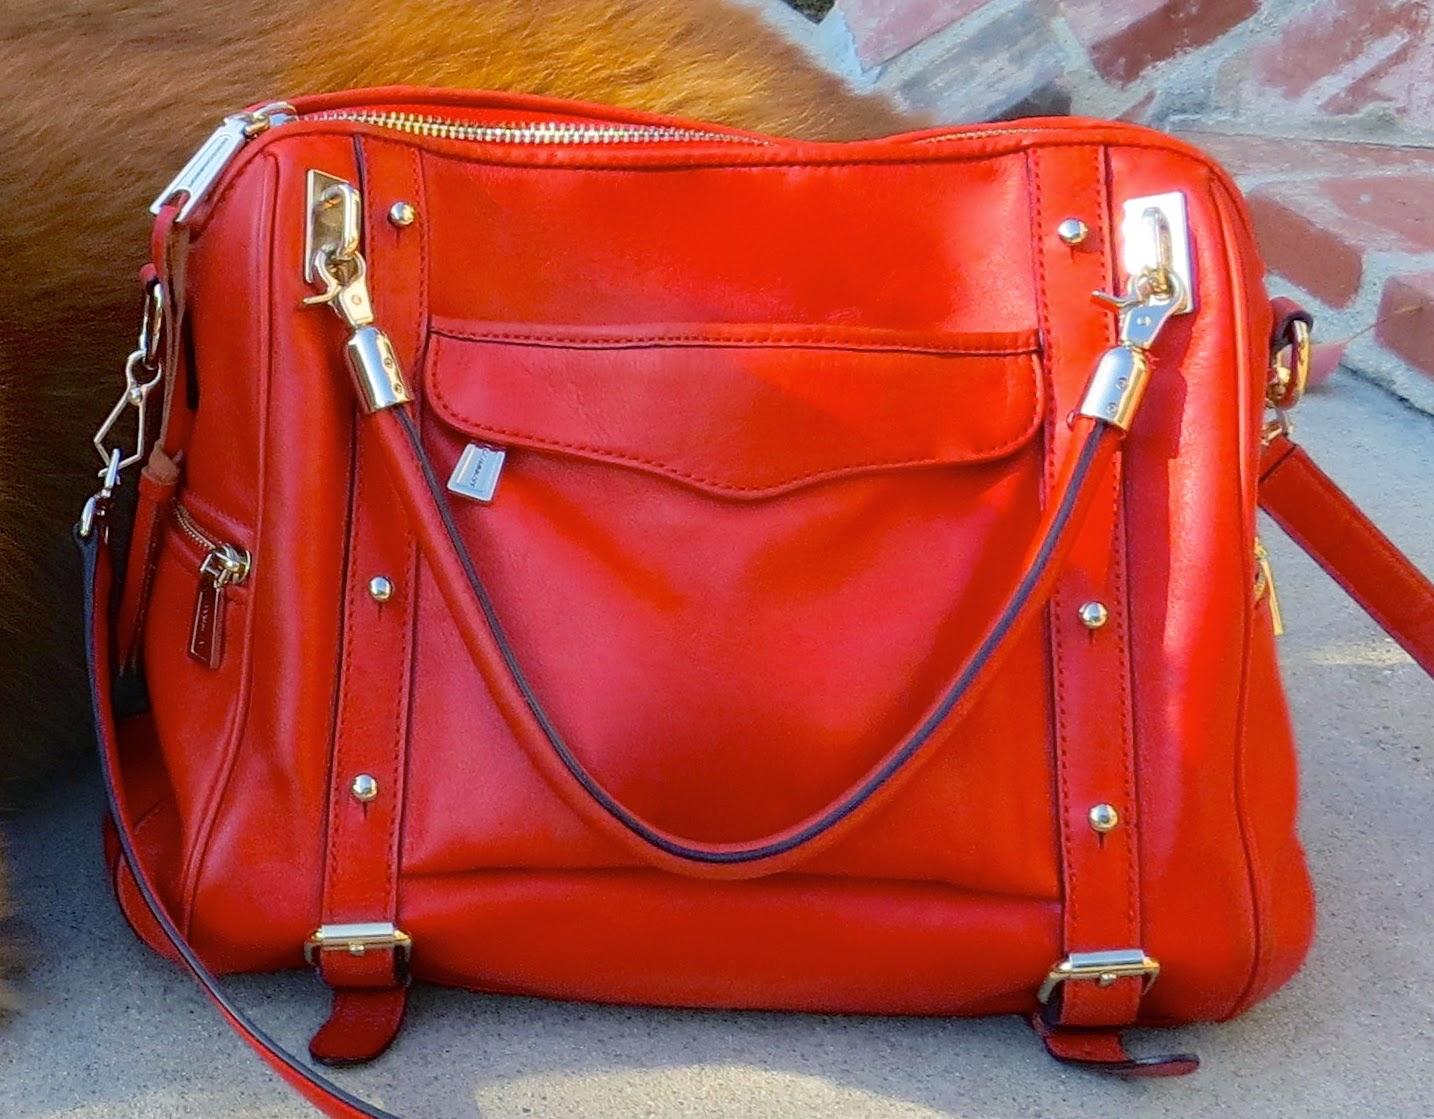 ea8812b41ad2 Rebecca Minkoff Cupid bag front pockets by Hello Handbag